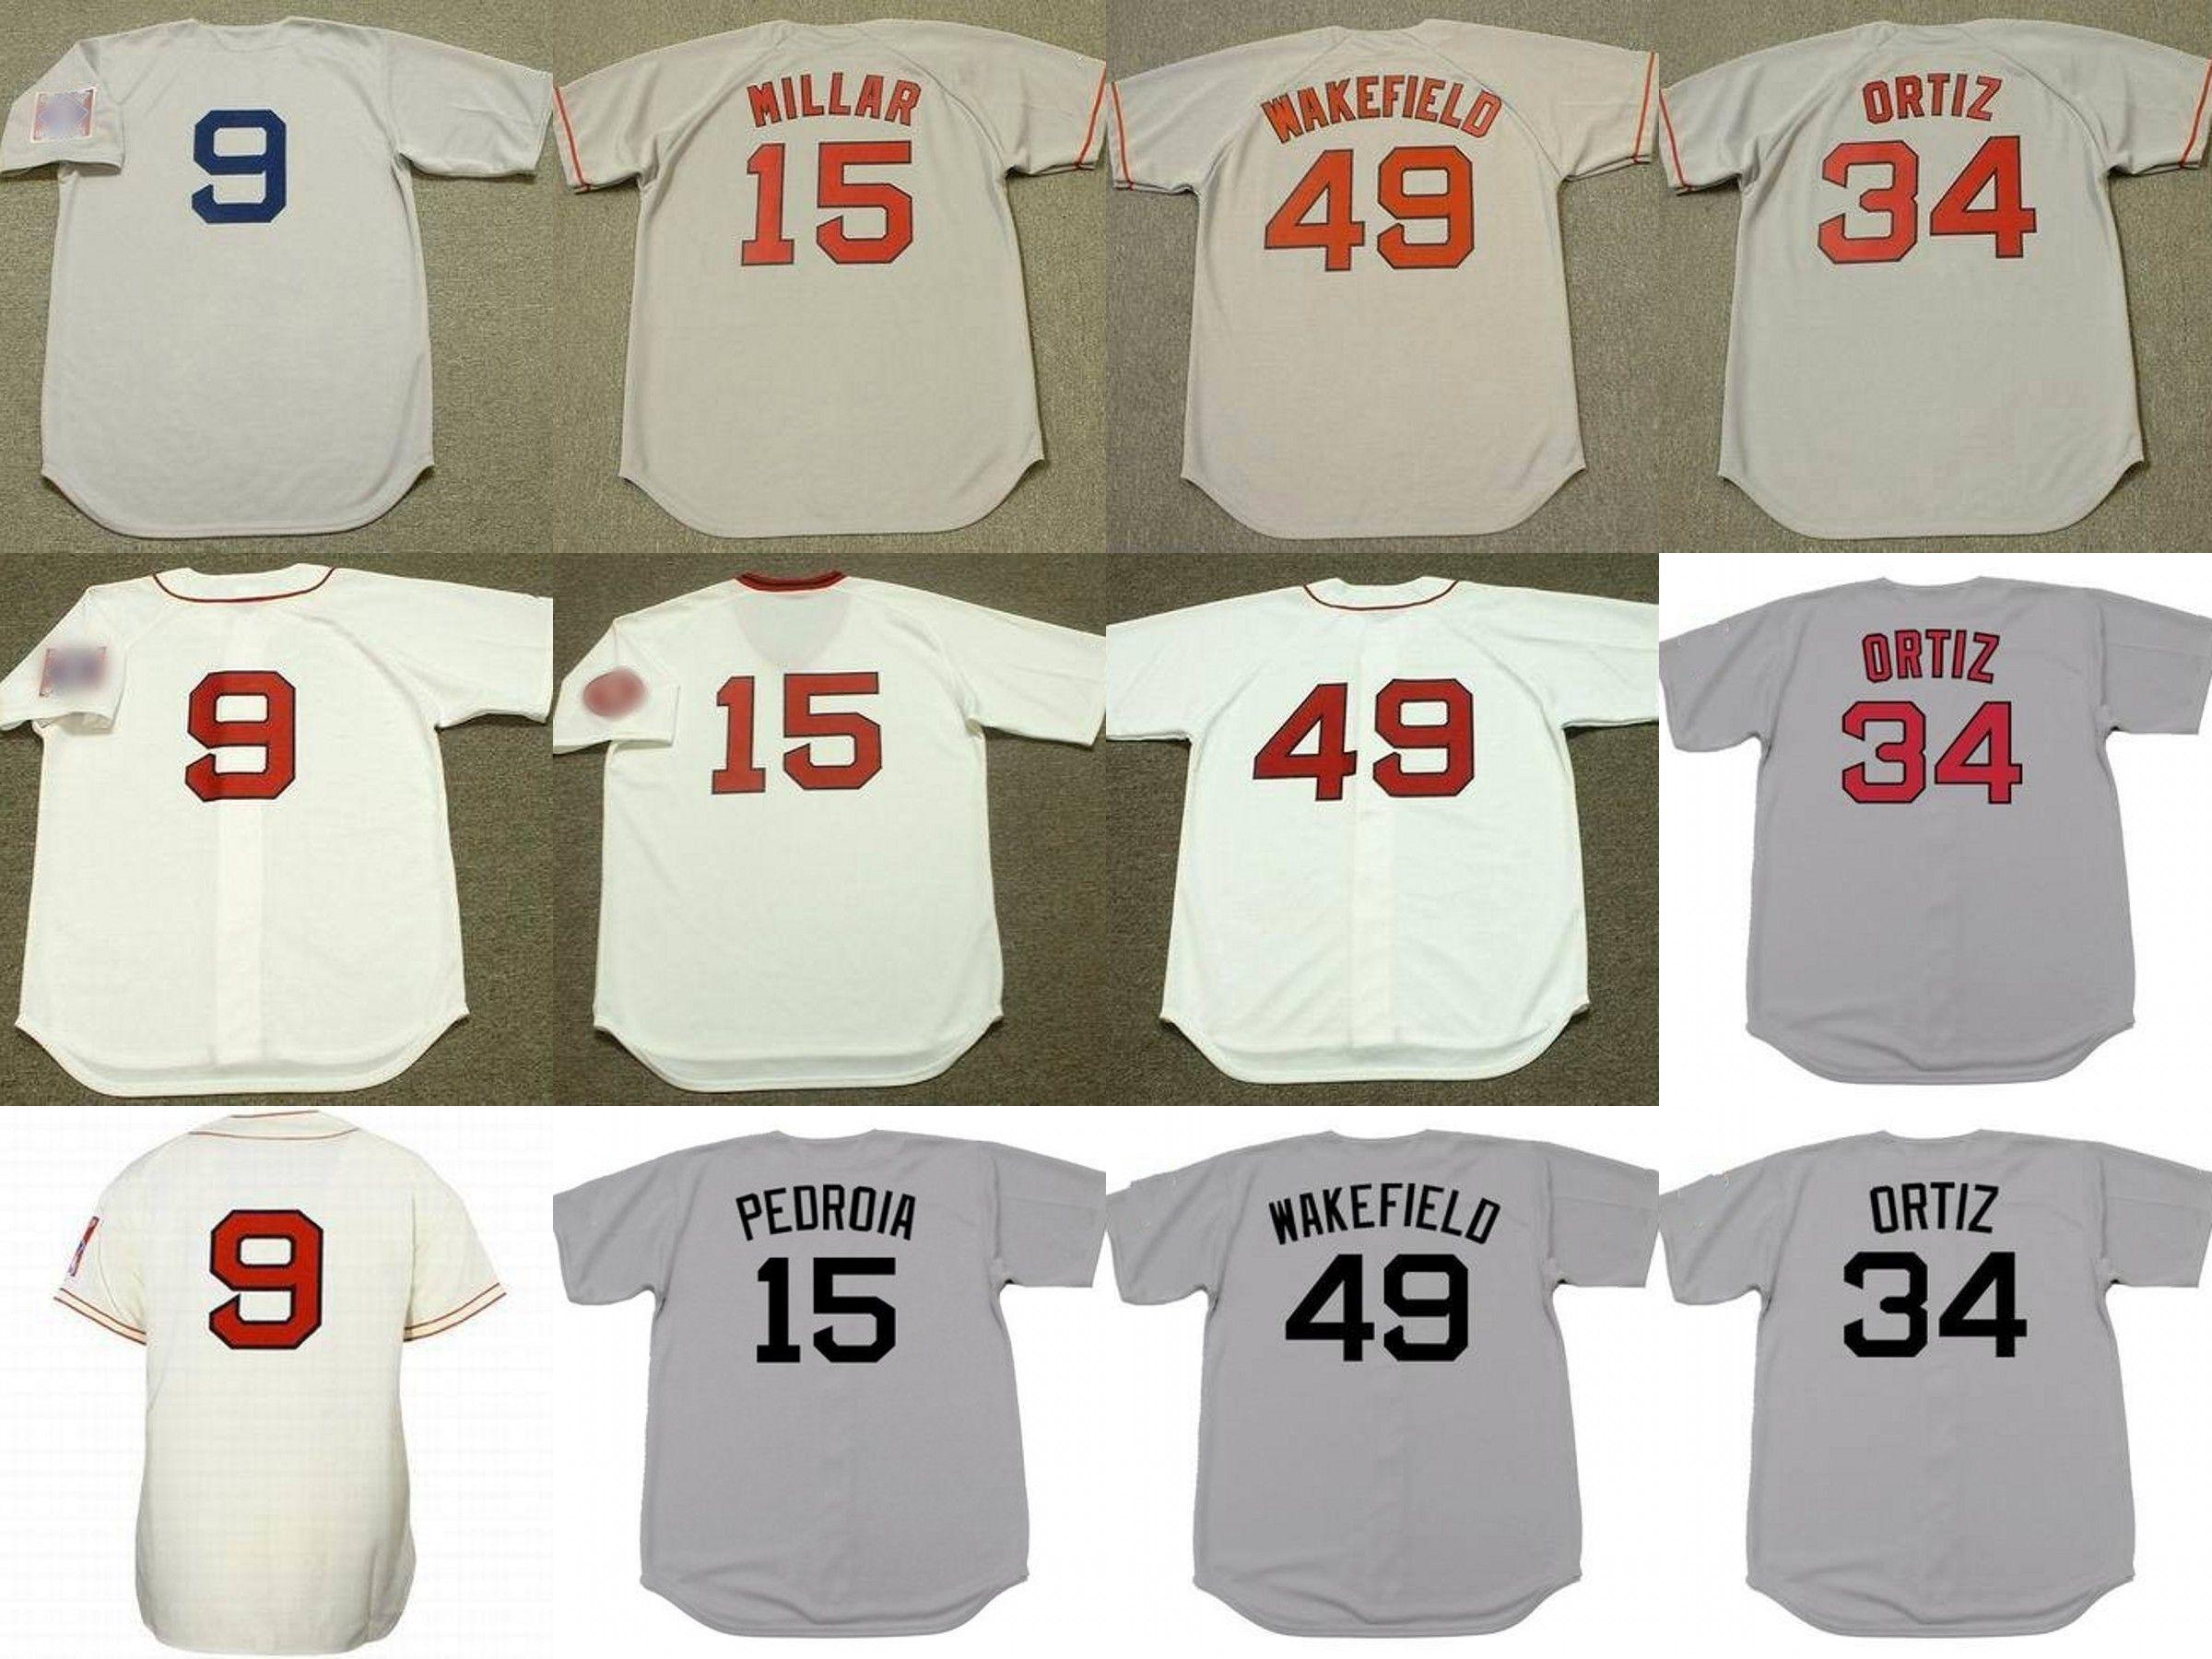 1f6e78f52 2018 Men Women Youth 15 Dustin Pedroia 9 Ted Williams 49 Tim Wakefield  Boston Baseball Jersey From B2bcn